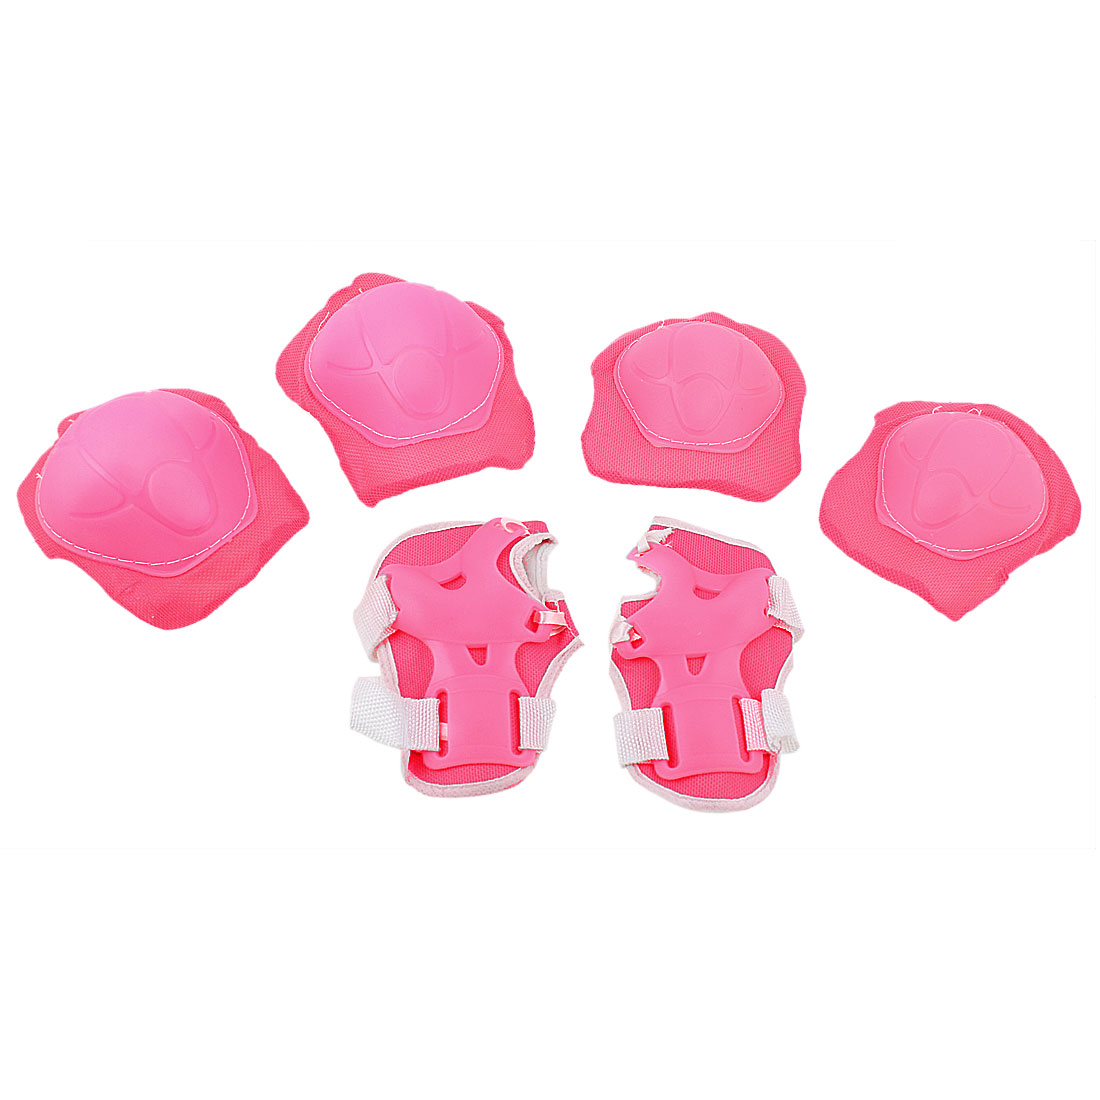 6pcs Kids Elbow Knee Pad Palm Wrist Guard Set Sports Protective Gear